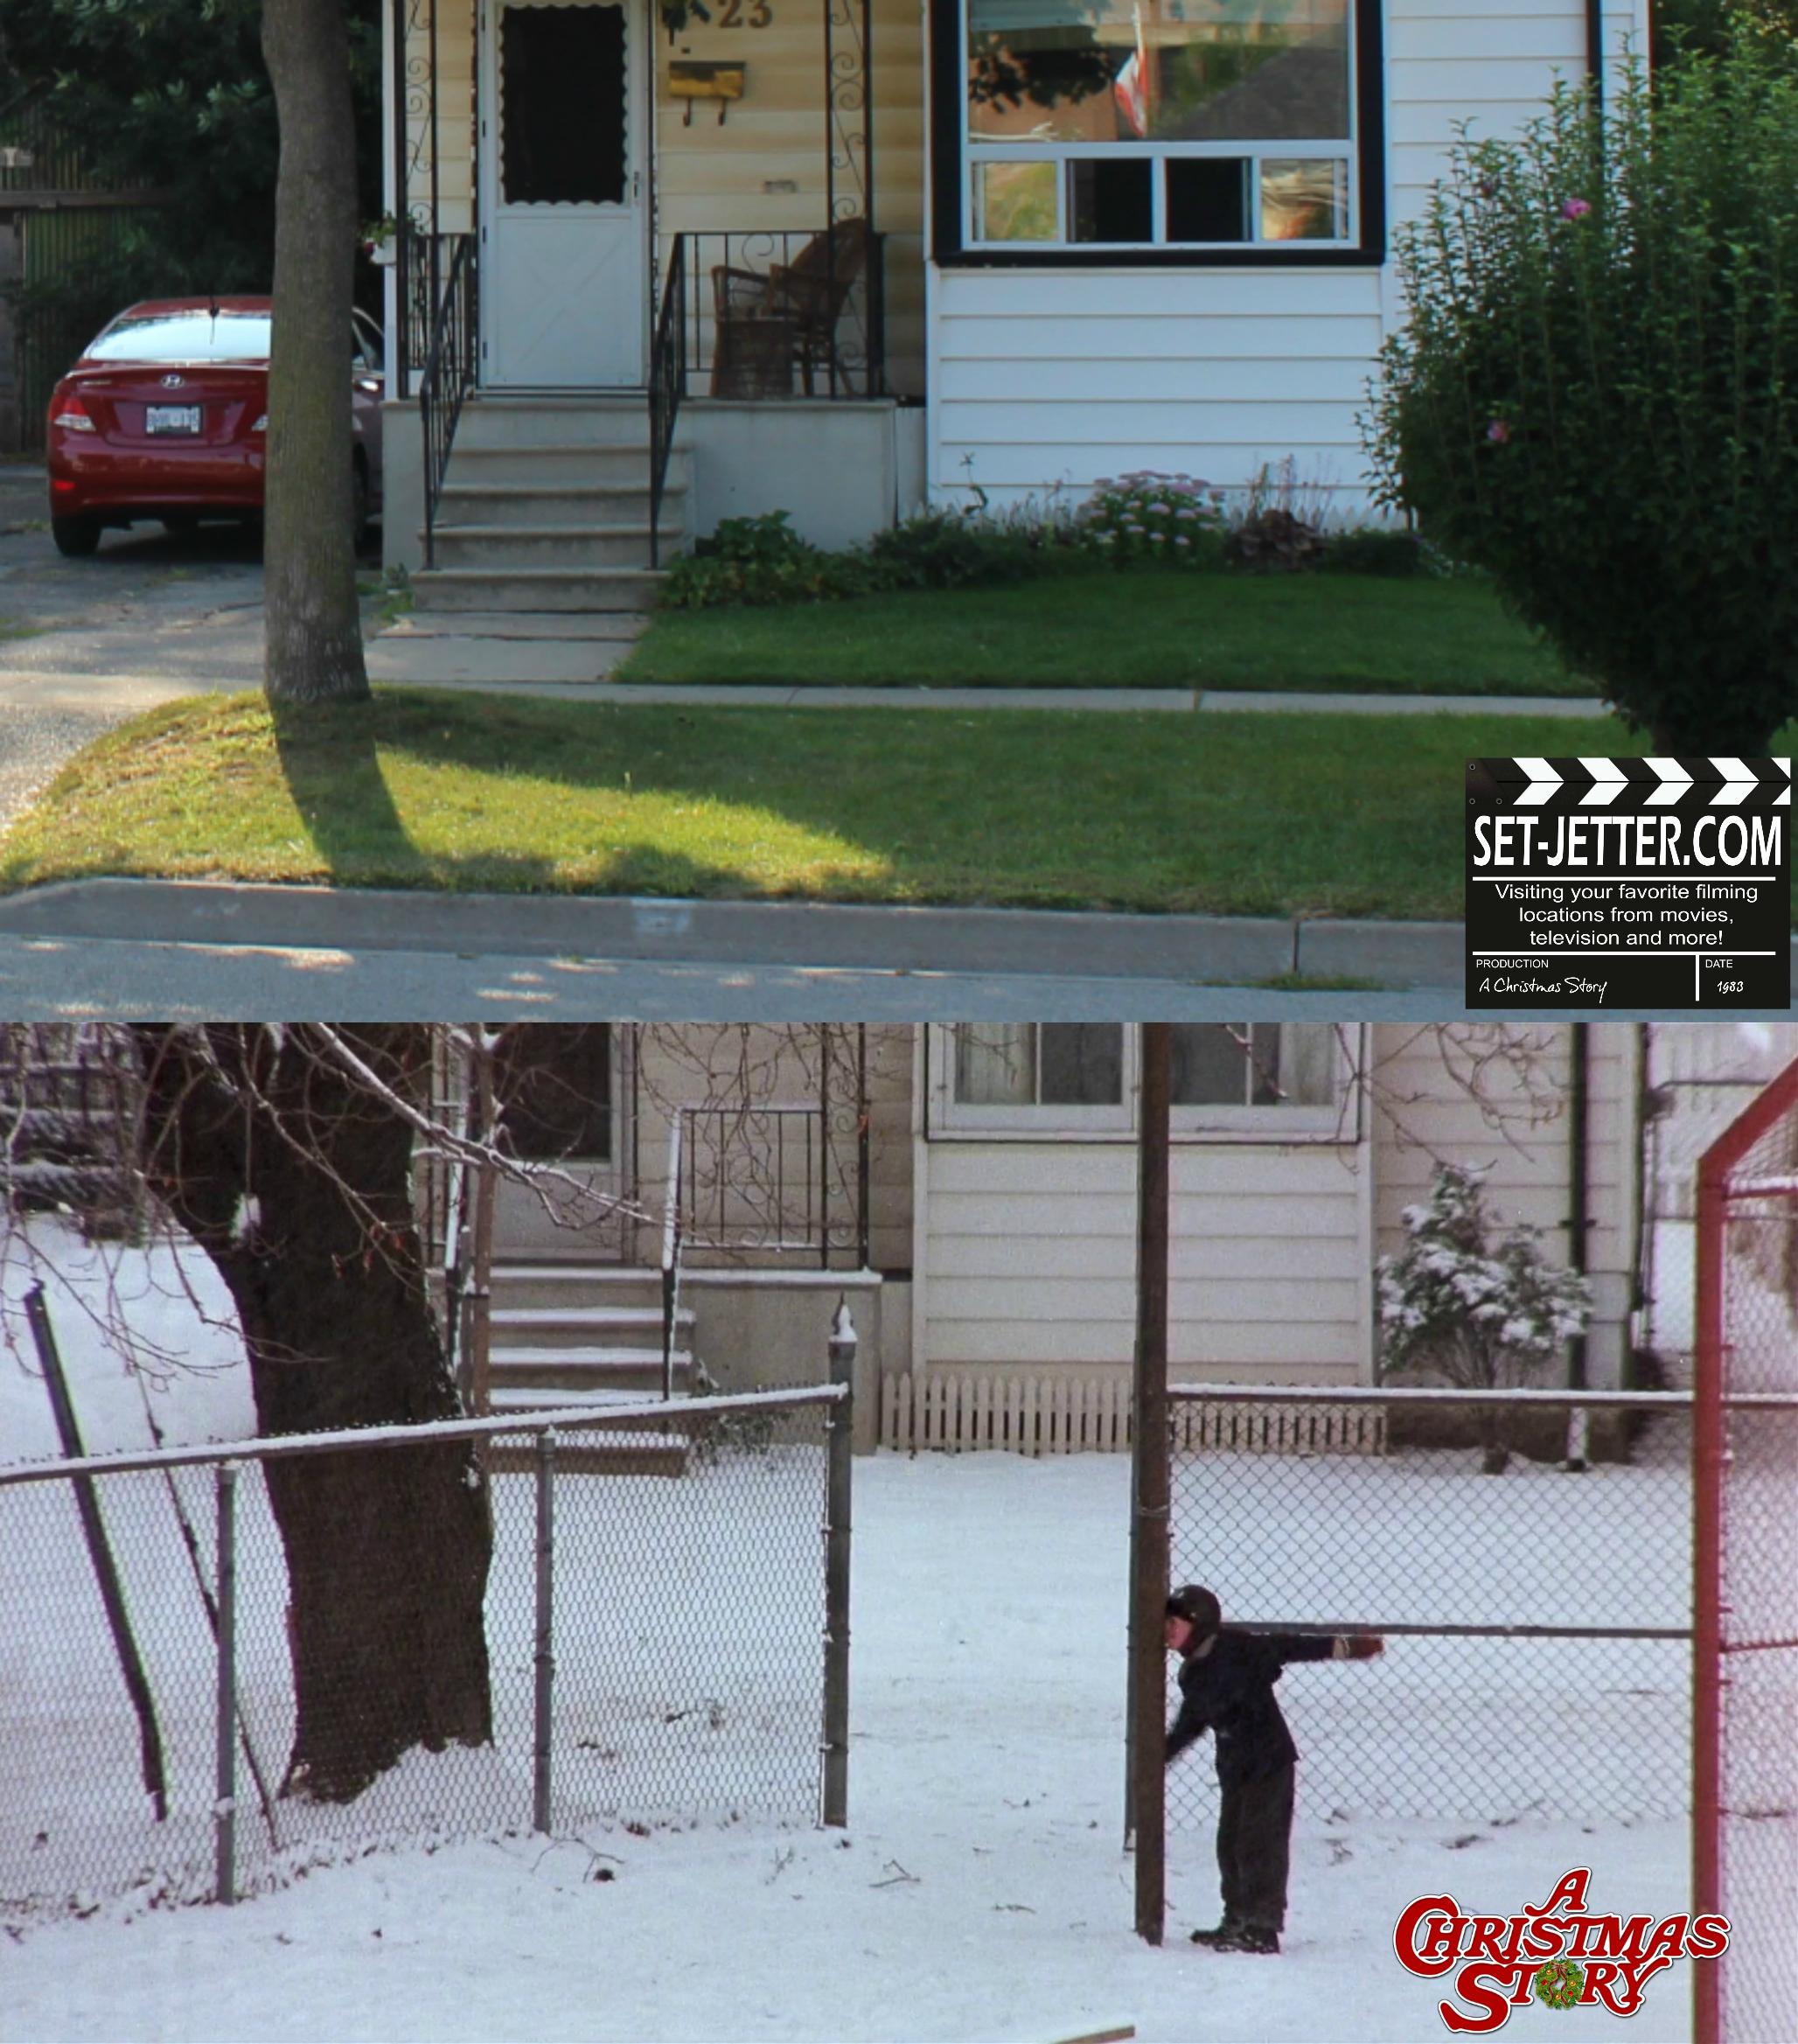 Christmas Story comparison 20.jpg